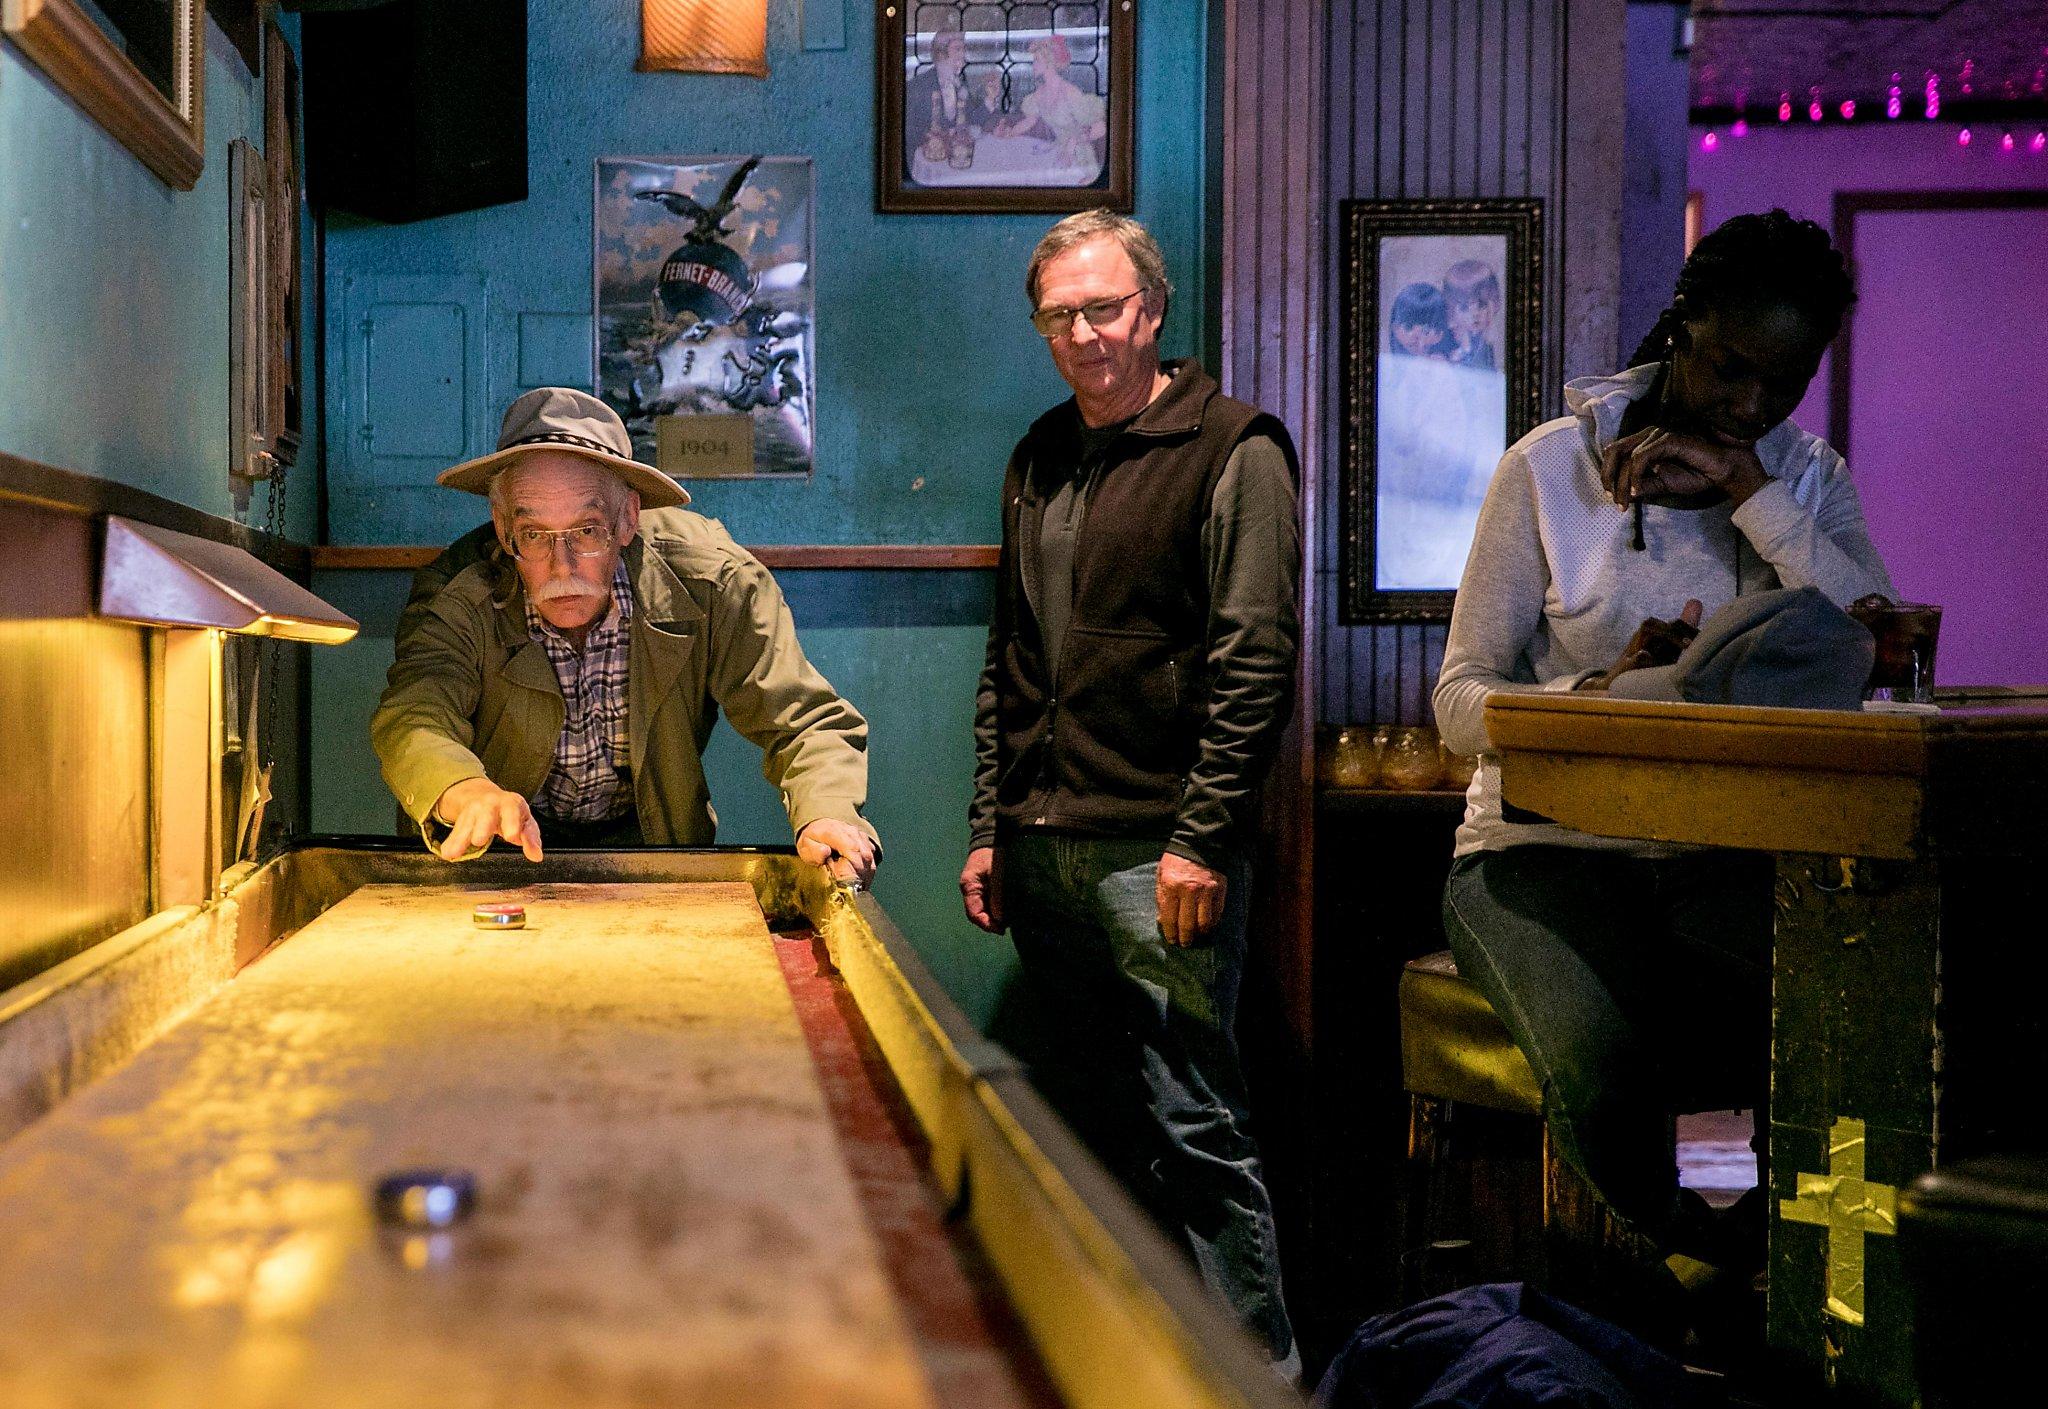 From Albany dive bar to Bay Area favorite, the Hotsy Totsy has a